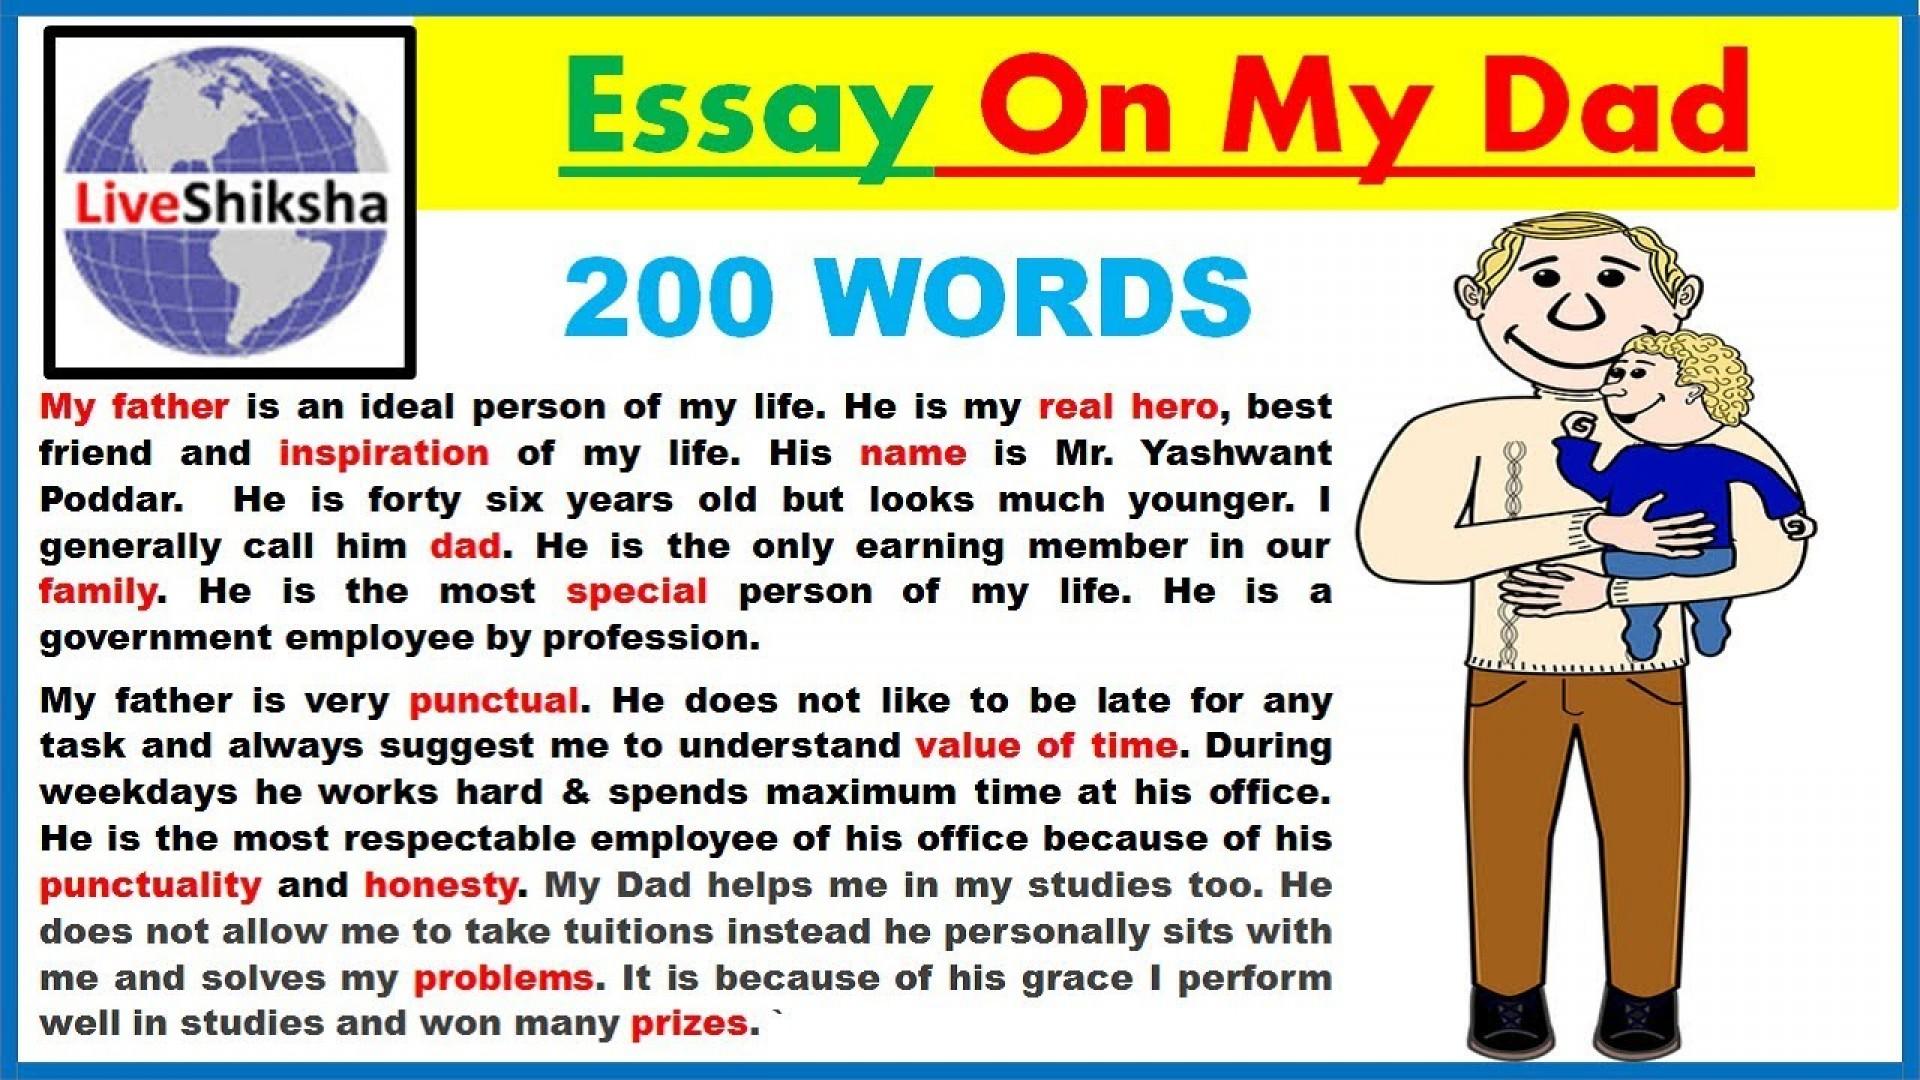 004 Maxresdefault Essay Example My Father Unusual Hero Parents Superhero 1920